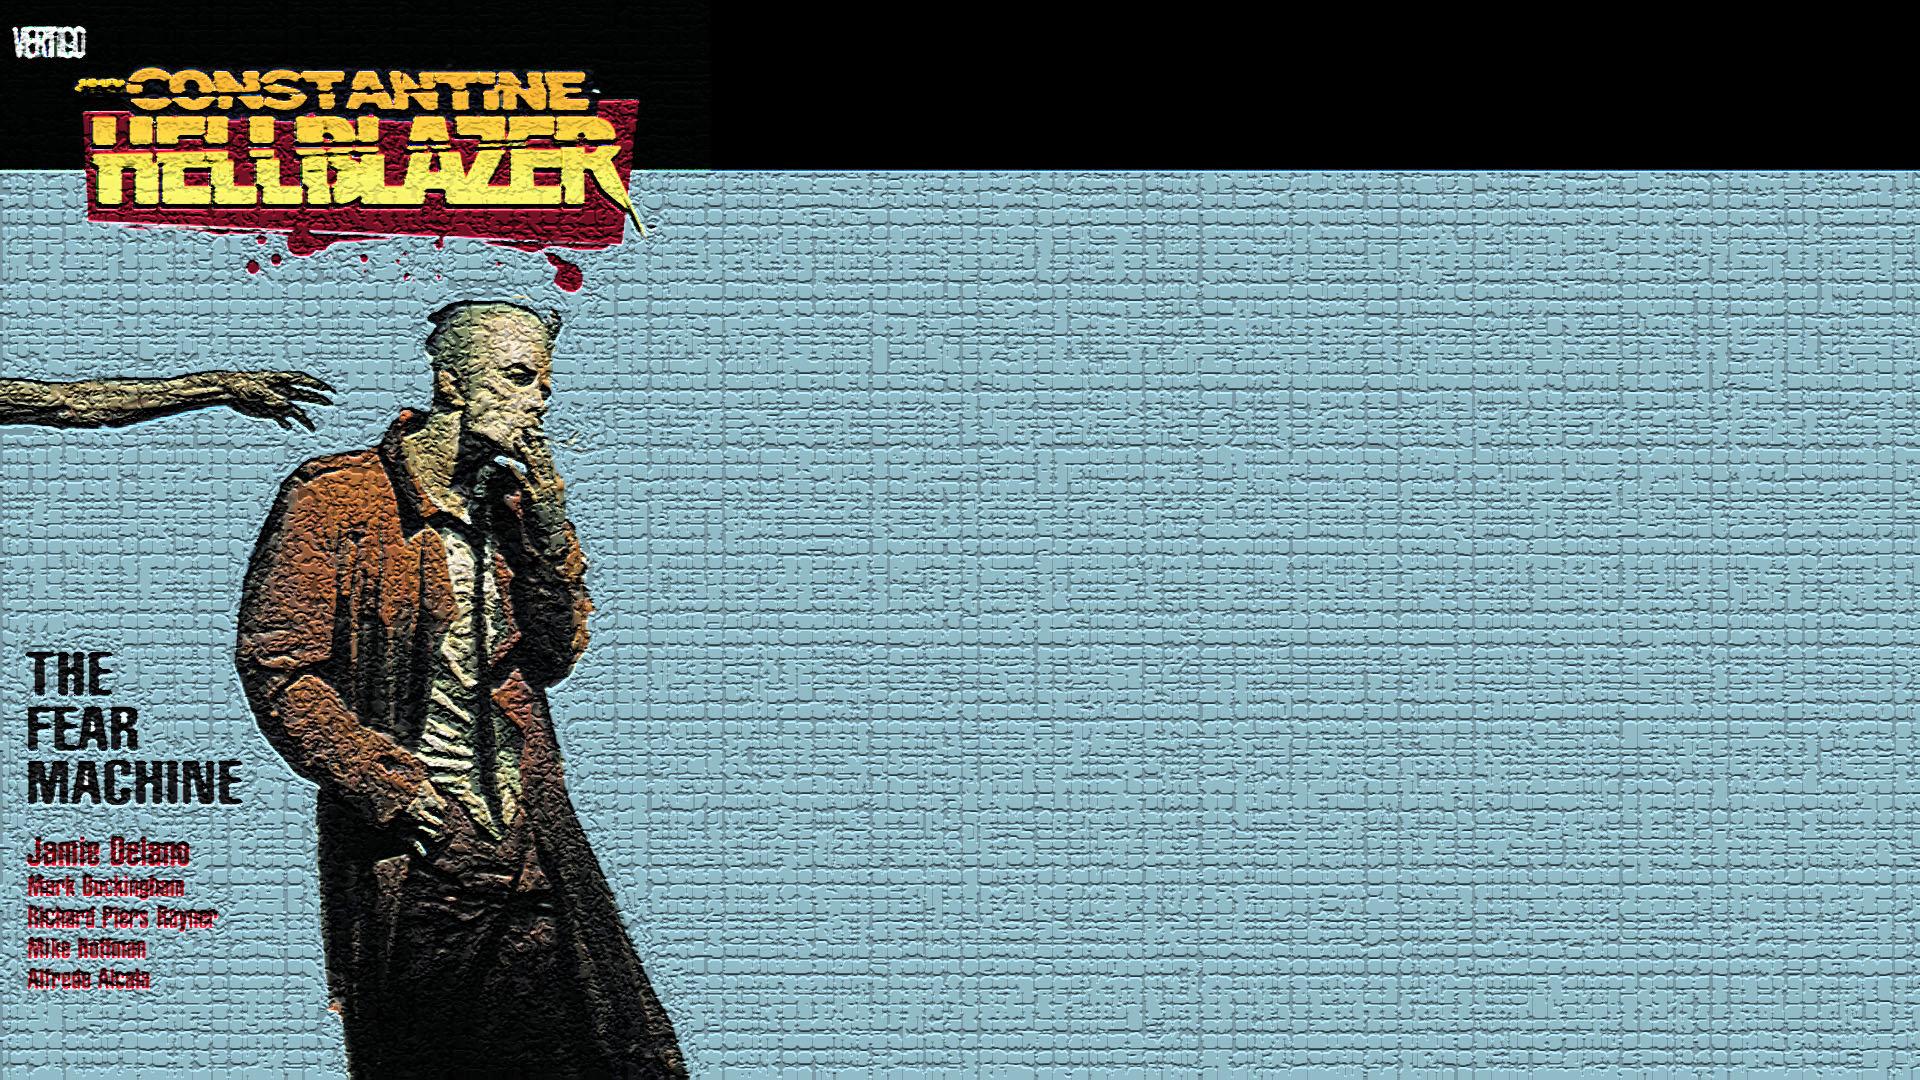 Download Full Hd 1920x1080 John Constantine Hellblazer